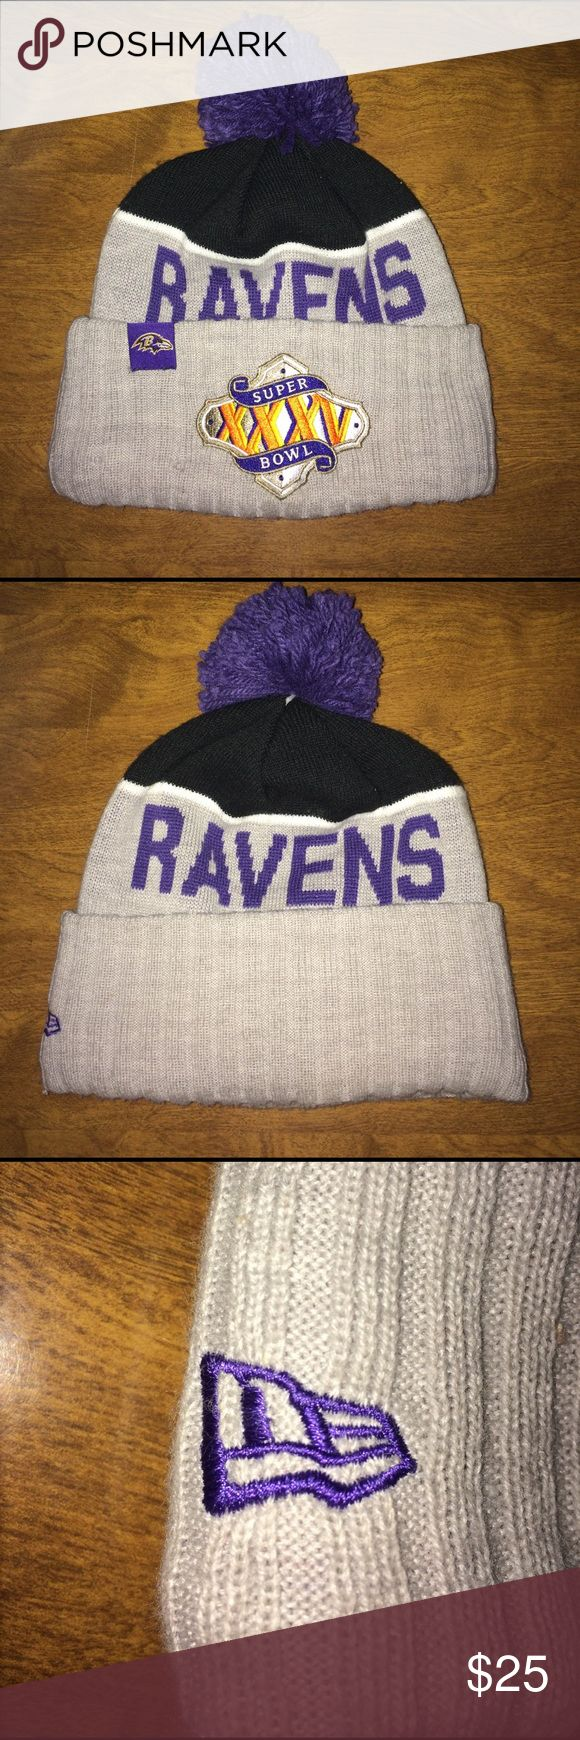 Ravens Super Bowl XXXV Beanie Good condition, very comfortable, 2 little holes New Era Accessories Hats